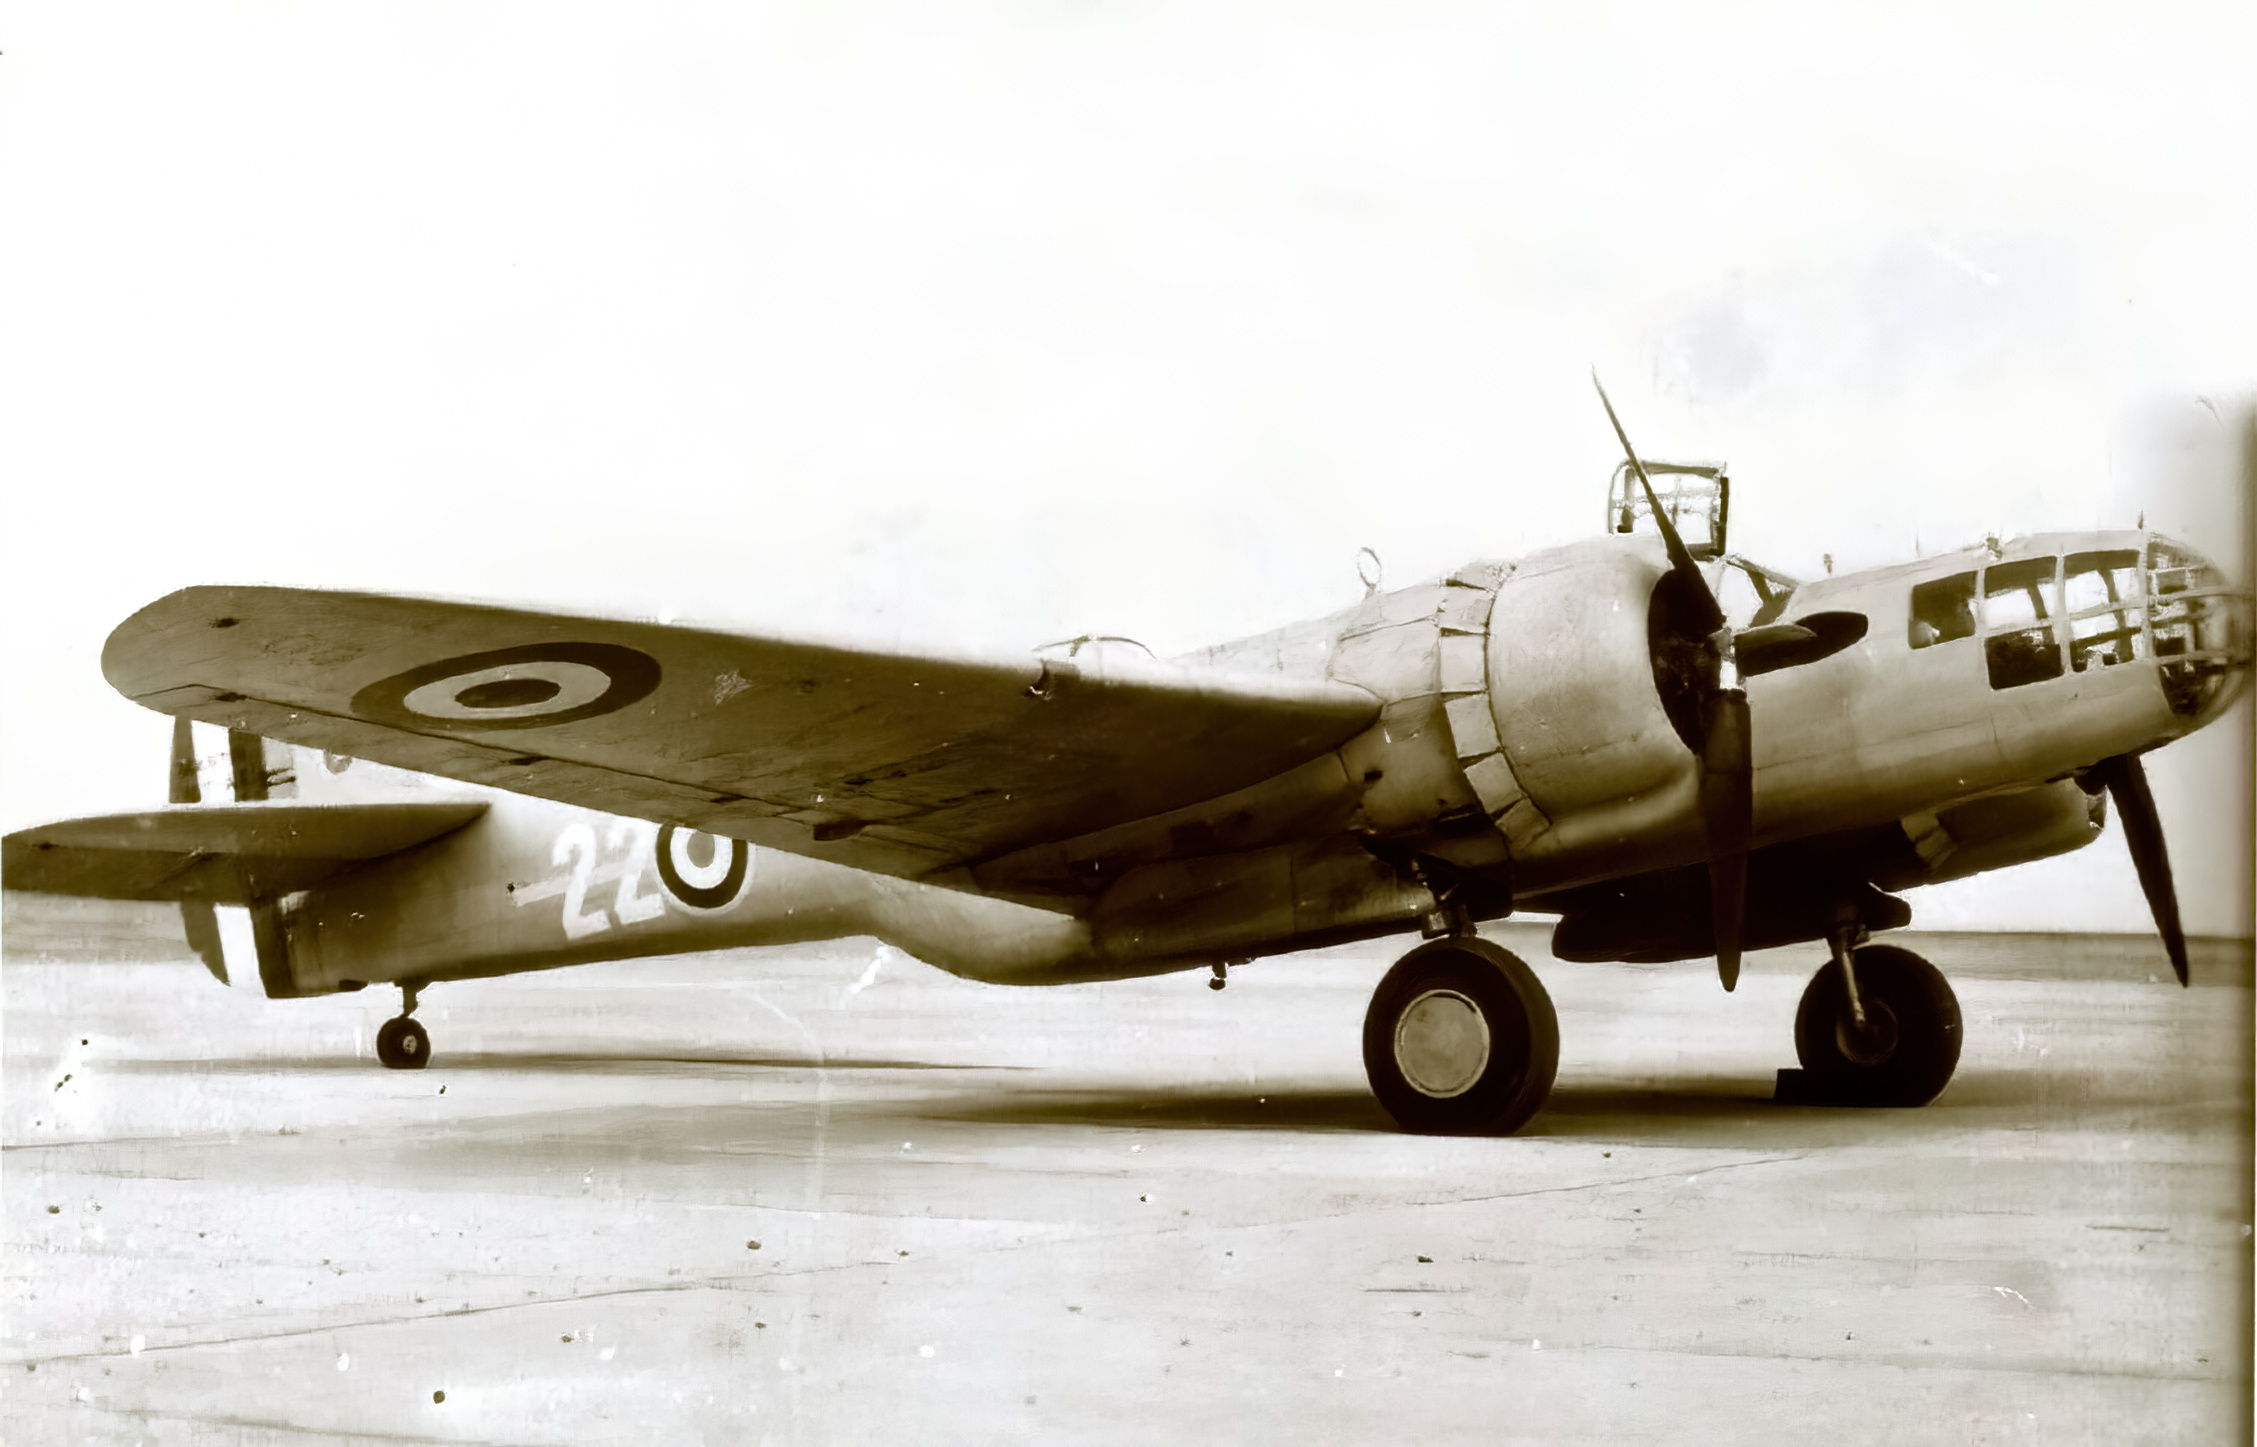 Vichy French Airforce Glen Martin 167 Maryland White 22 in North Africa ebay 01